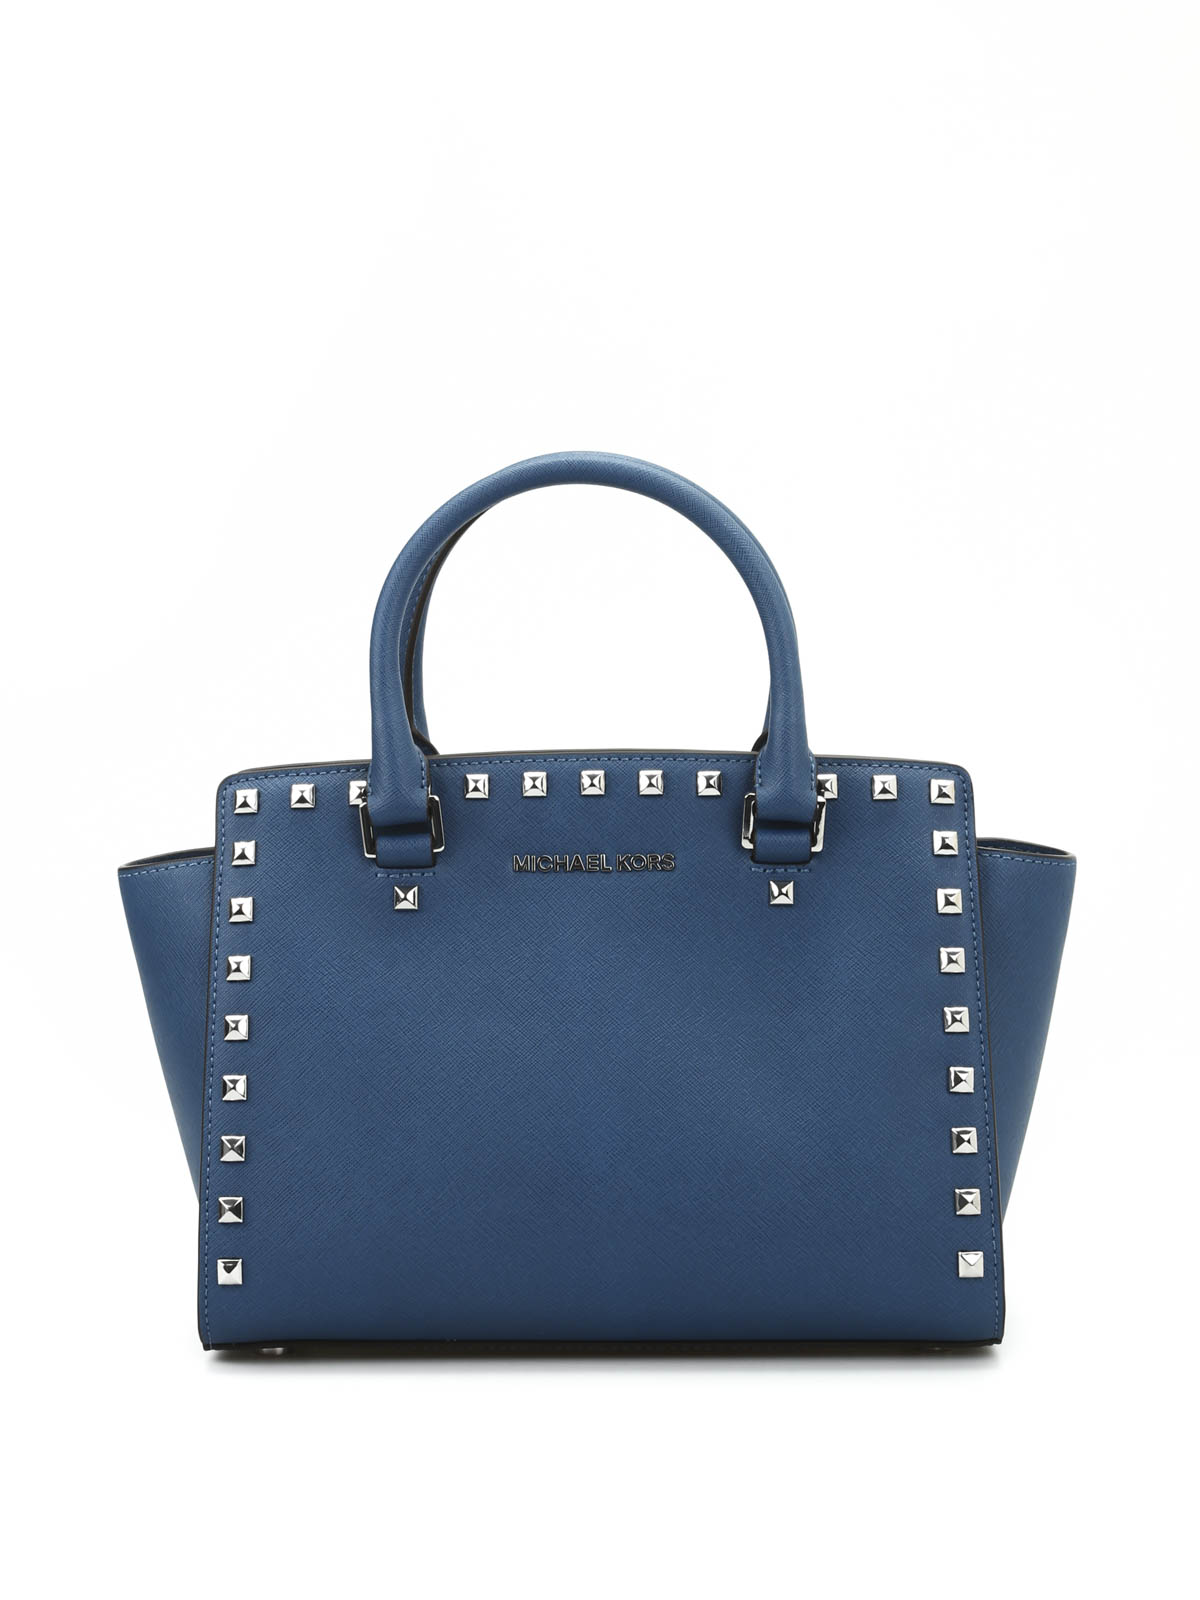 55612a6f27 Michael Kors - Selma medium studded tote - totes bags - 30T3SSMS2L 926